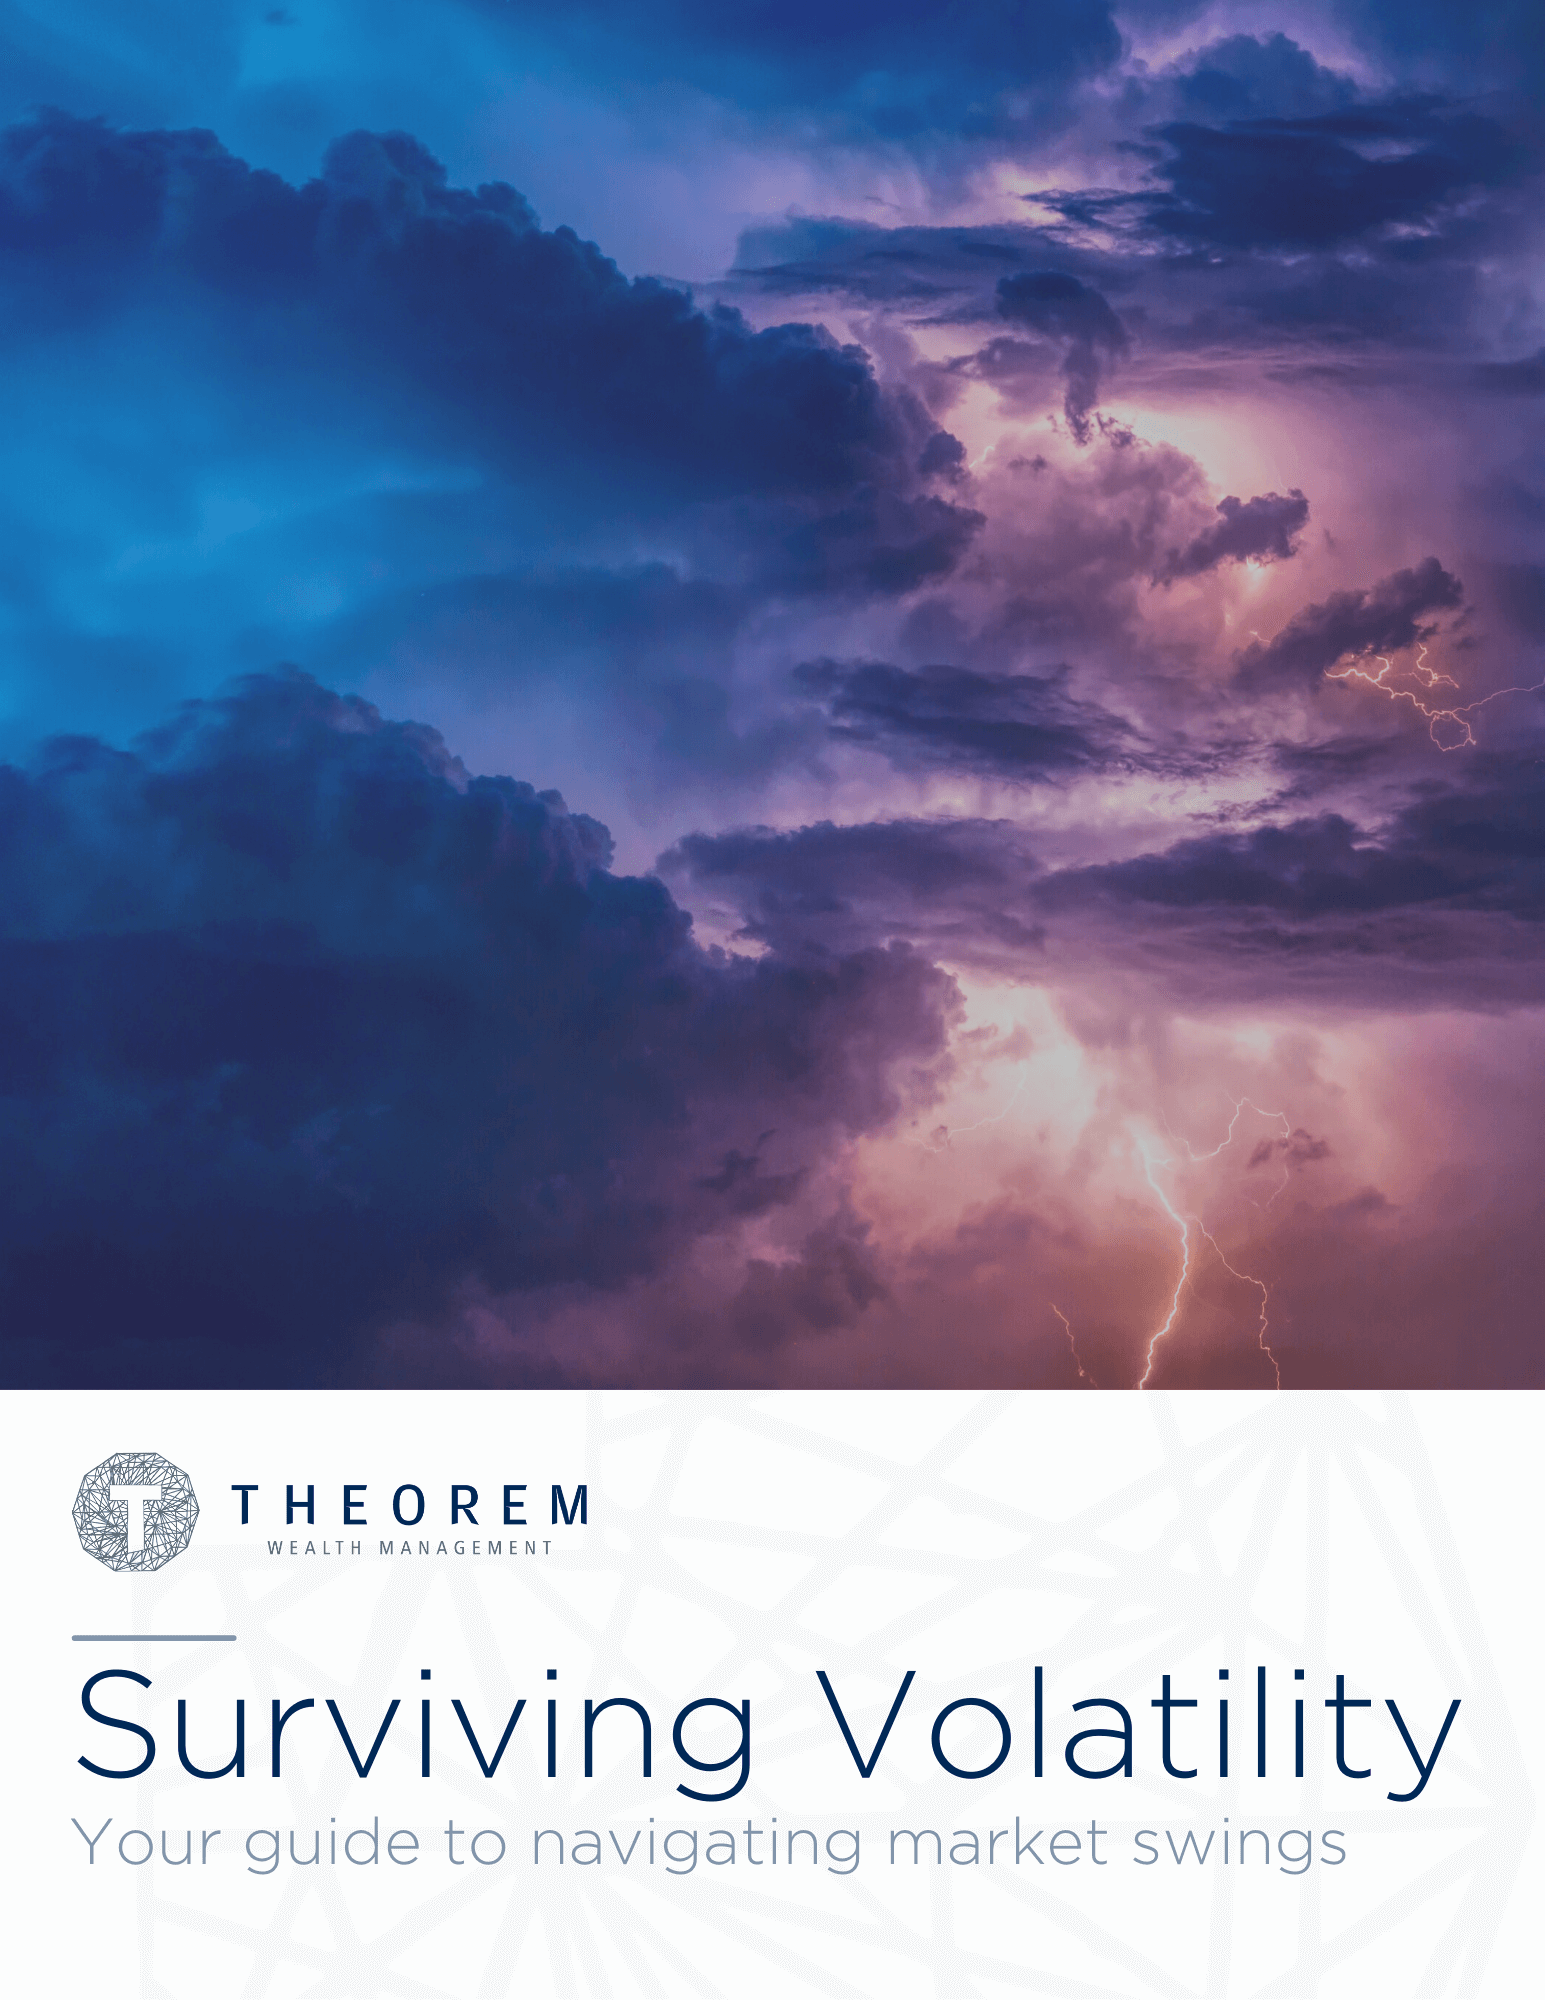 Surviving Volatility